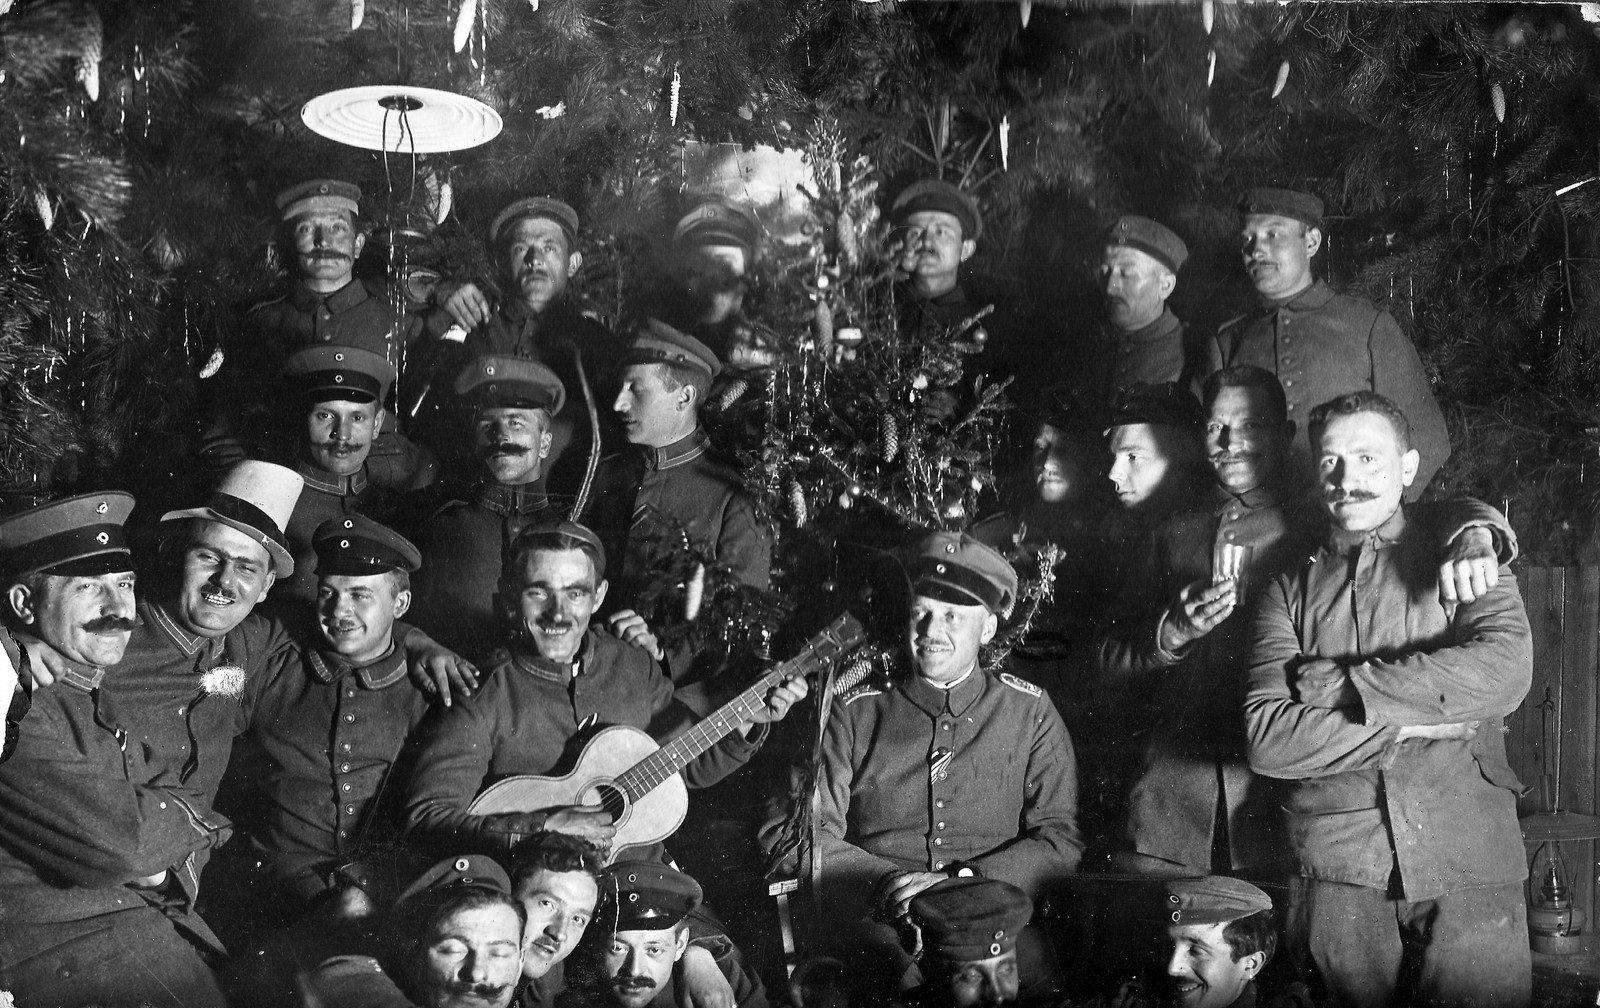 Weihnachtsfeier unter Sodaten, (1917), unbekannter Photograph, Rolf Kranz/Europeana 1914-1918, CC BY-SA